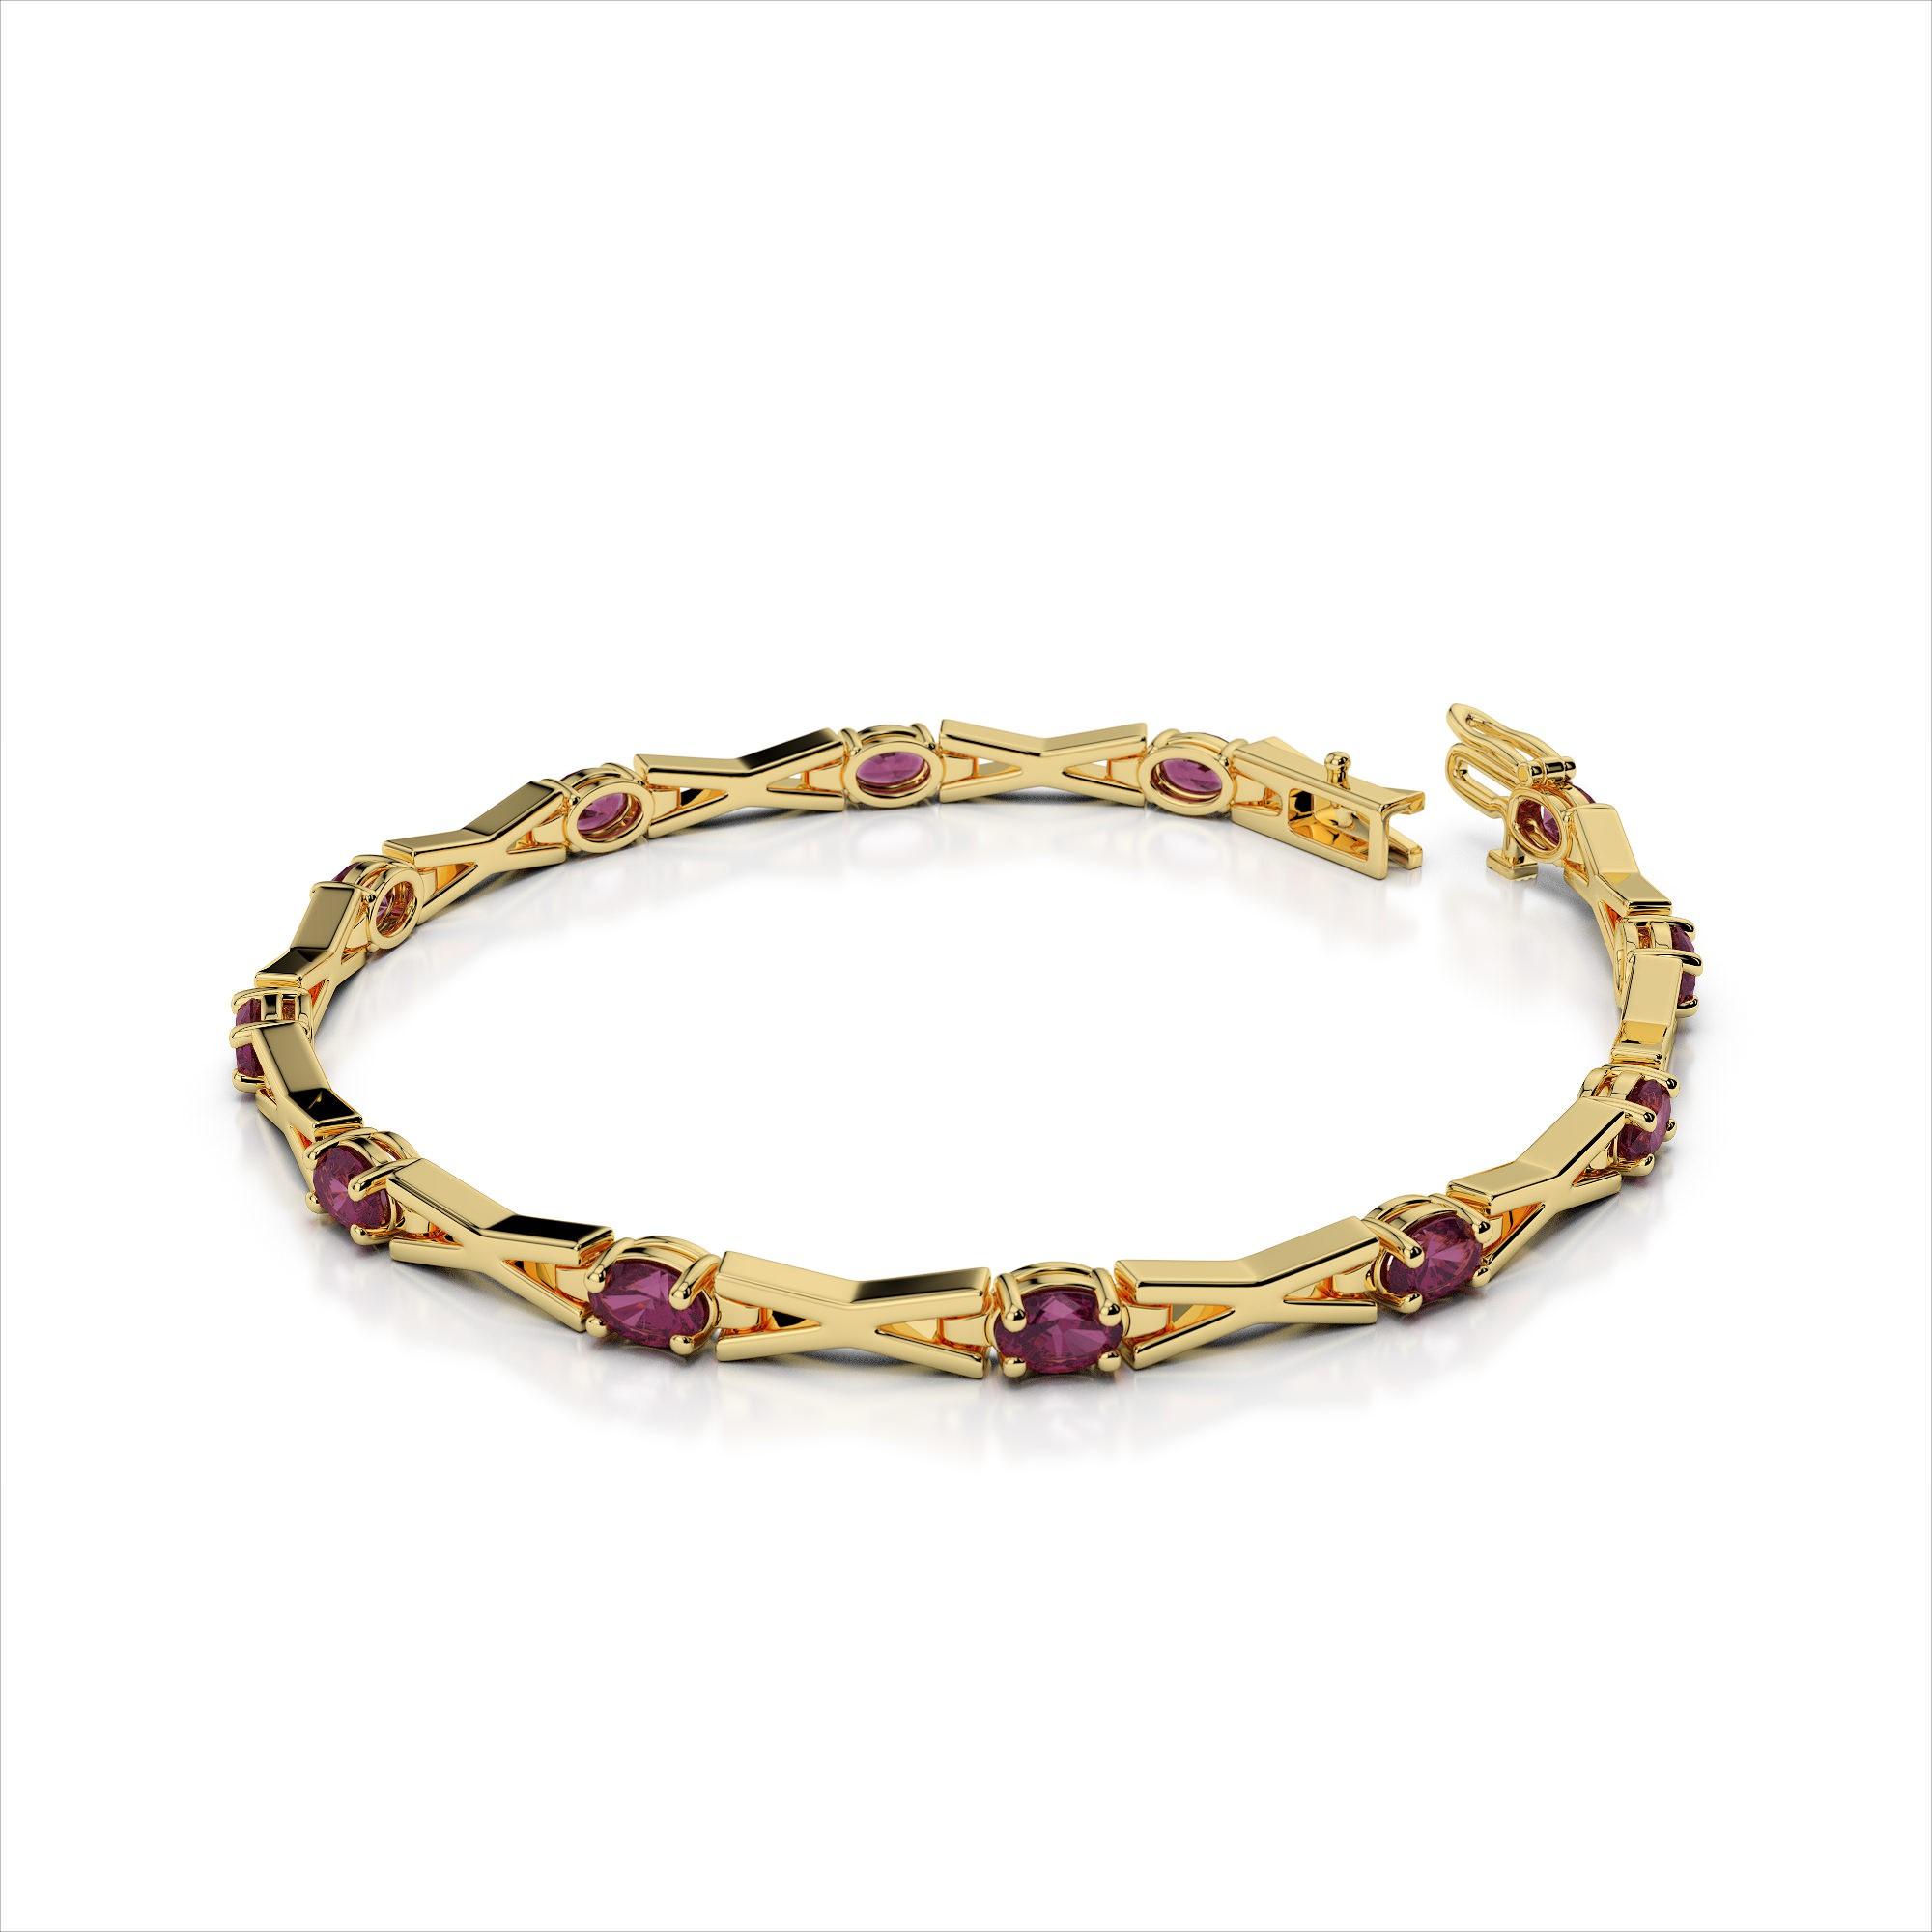 Cross Link 5x3mm Colored Stone Bracelet